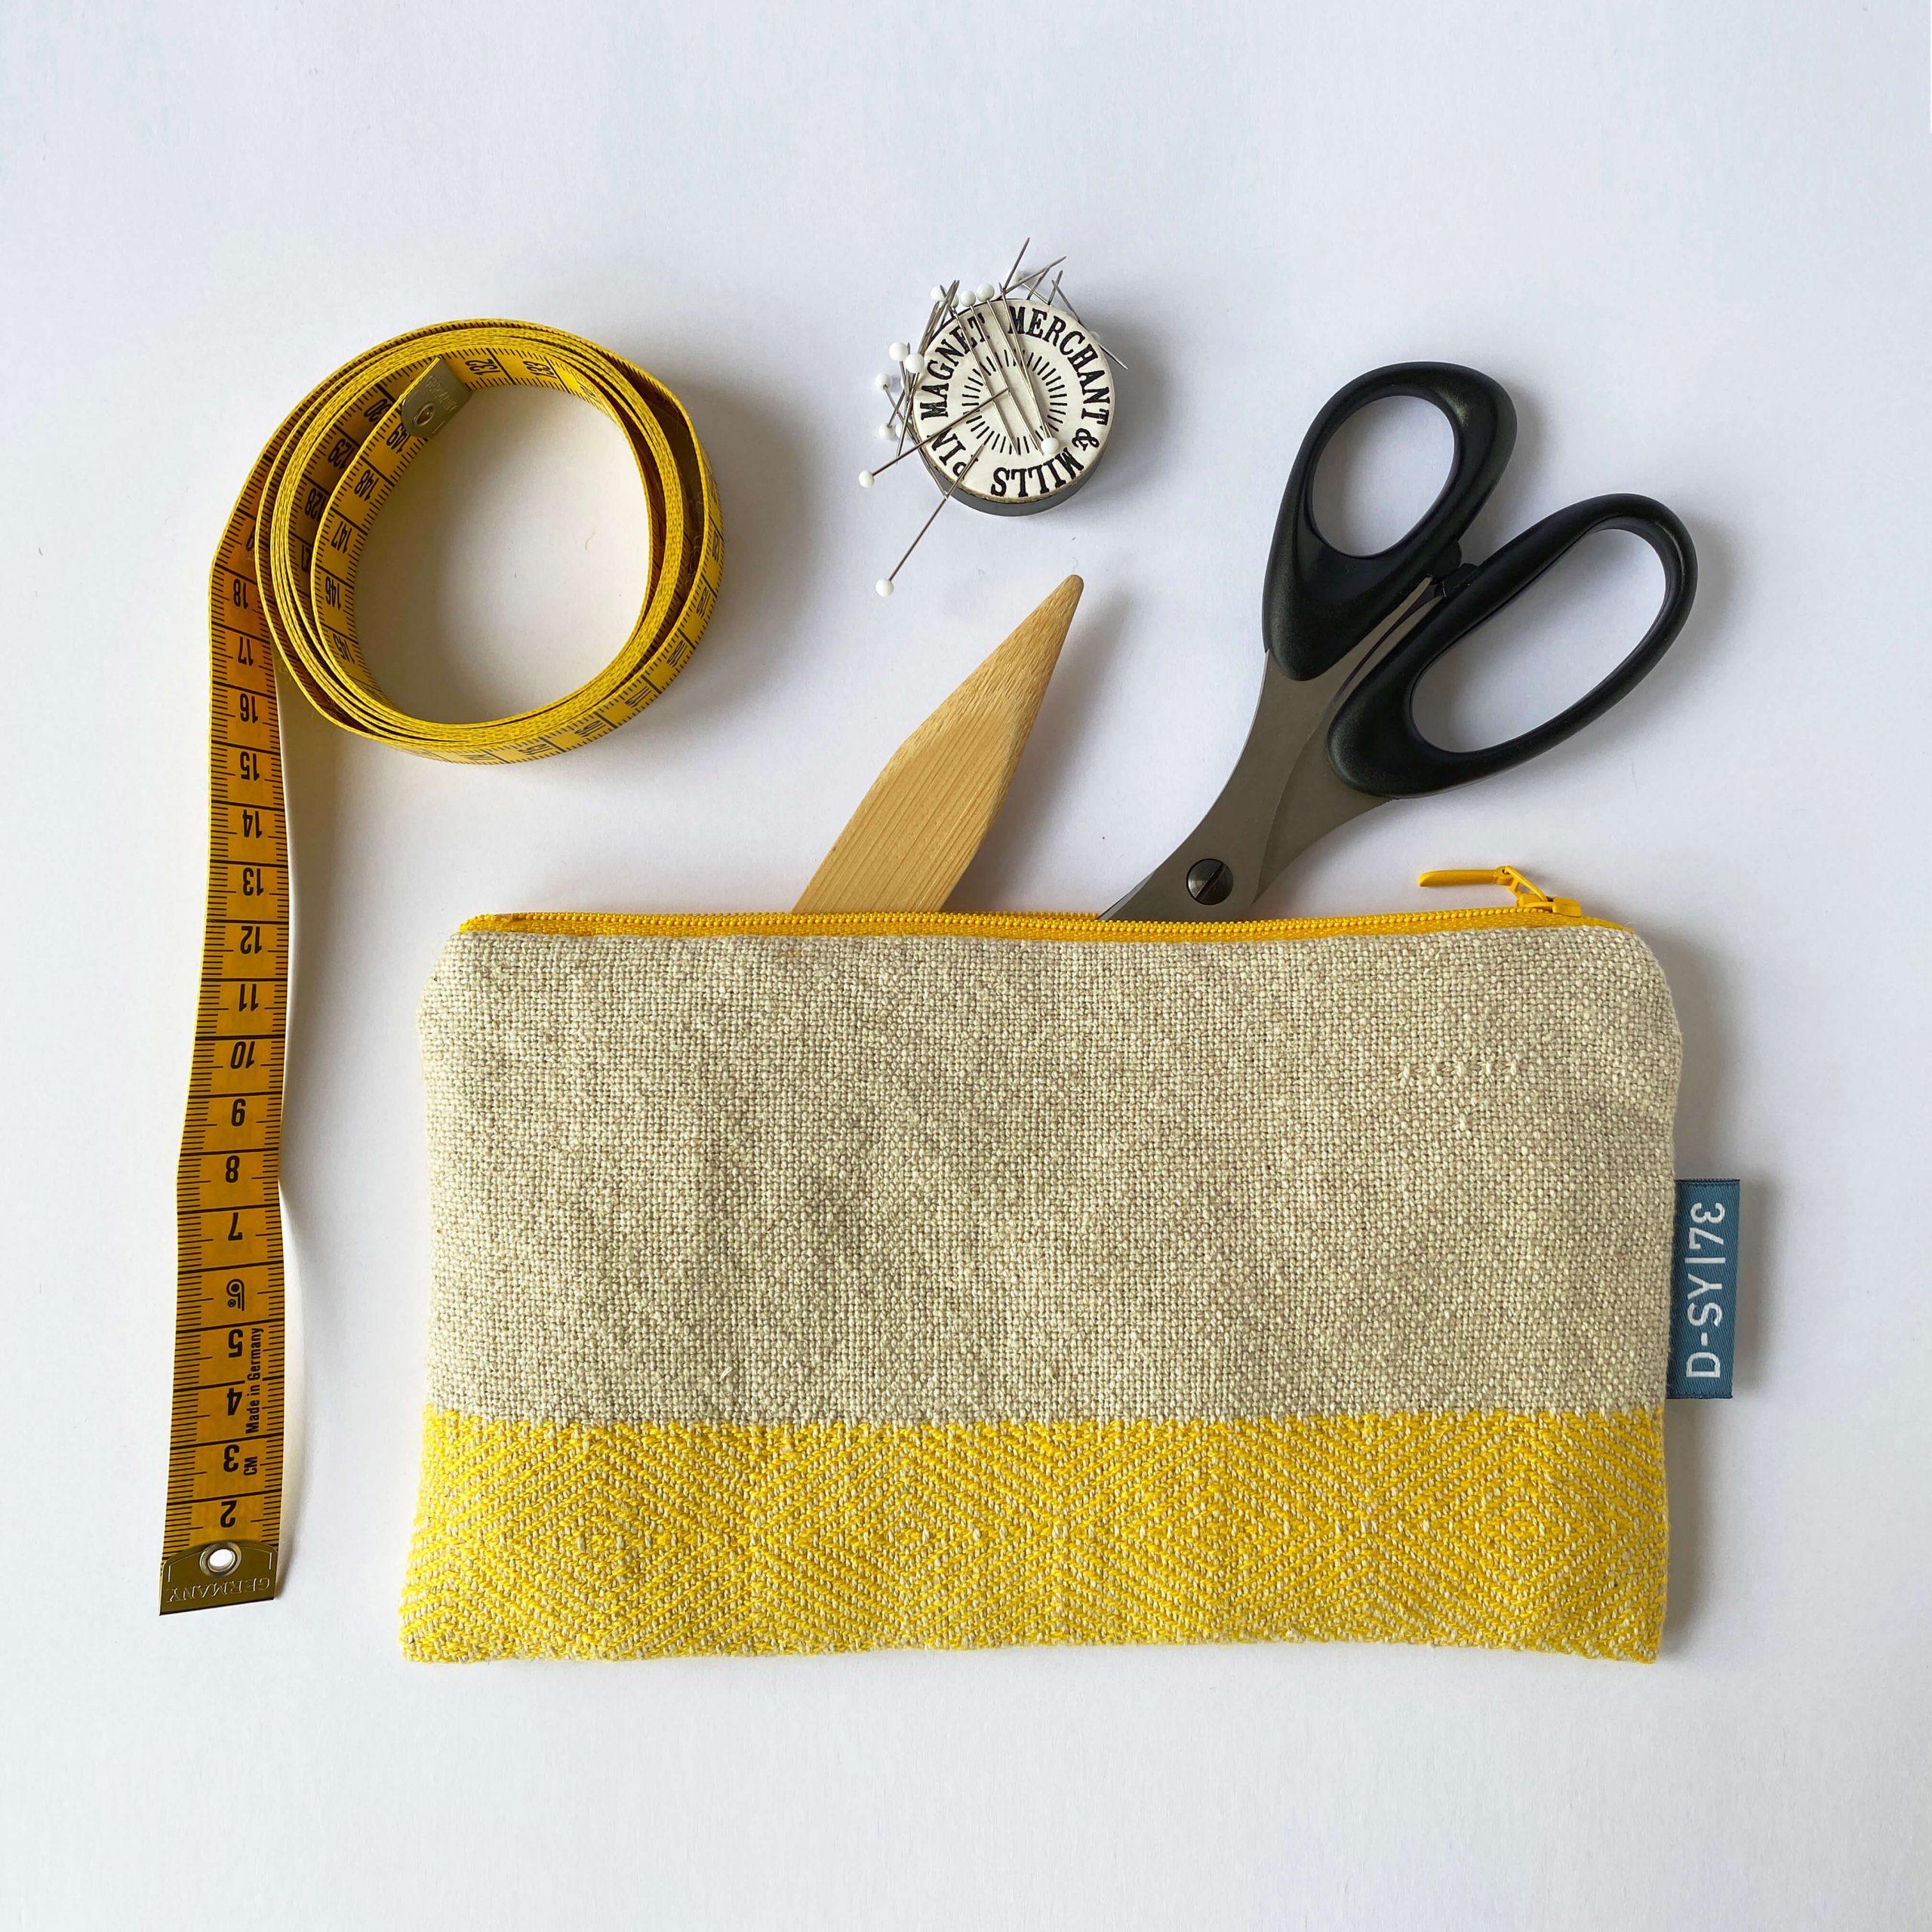 Zipperbag in point twill & plain weave (06ZB)